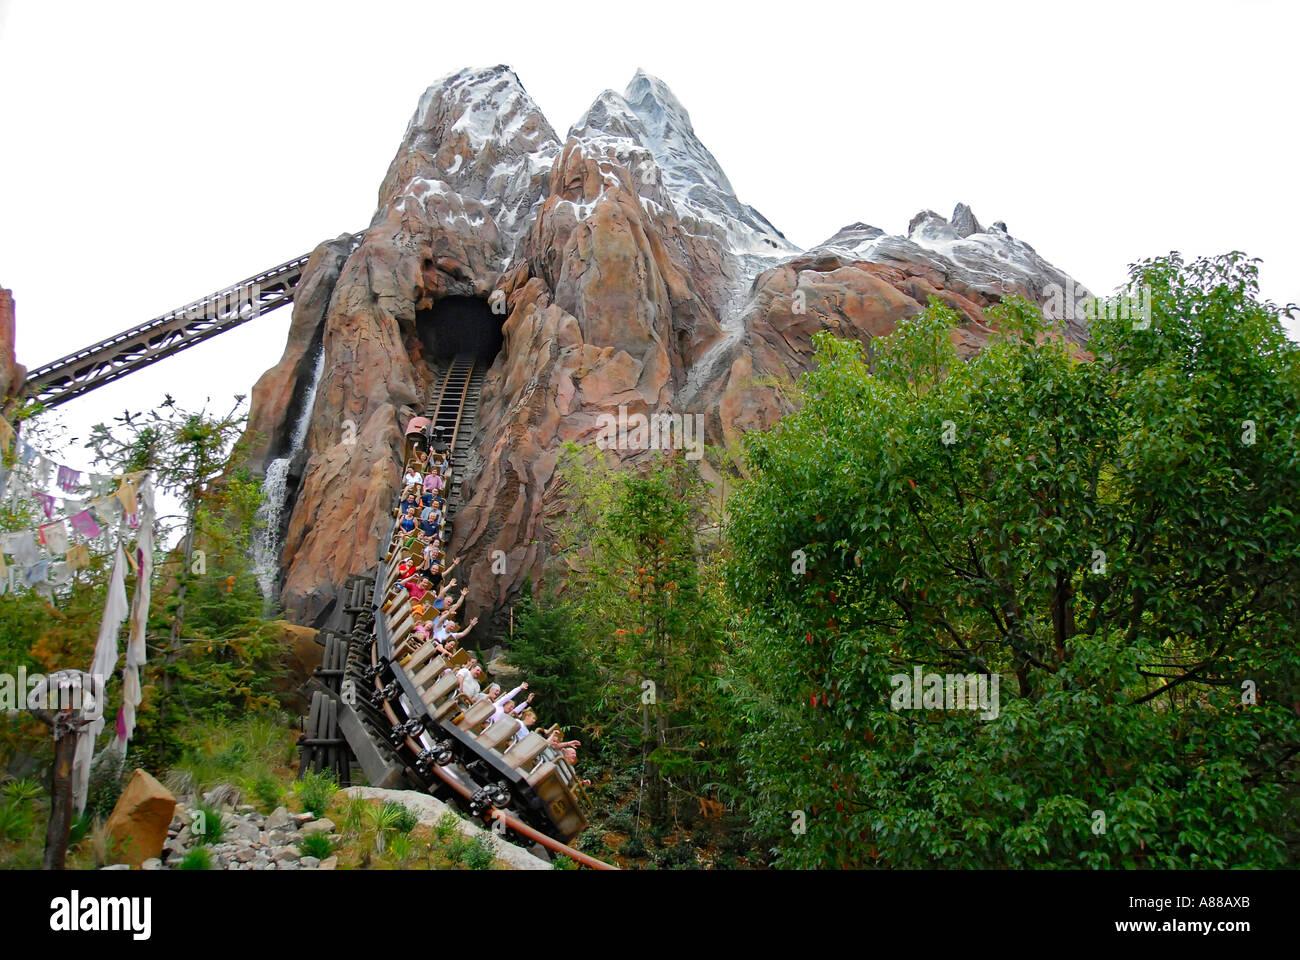 Expedition everest roller coaster at the animal kingdom park at disney world theme park orlando florida